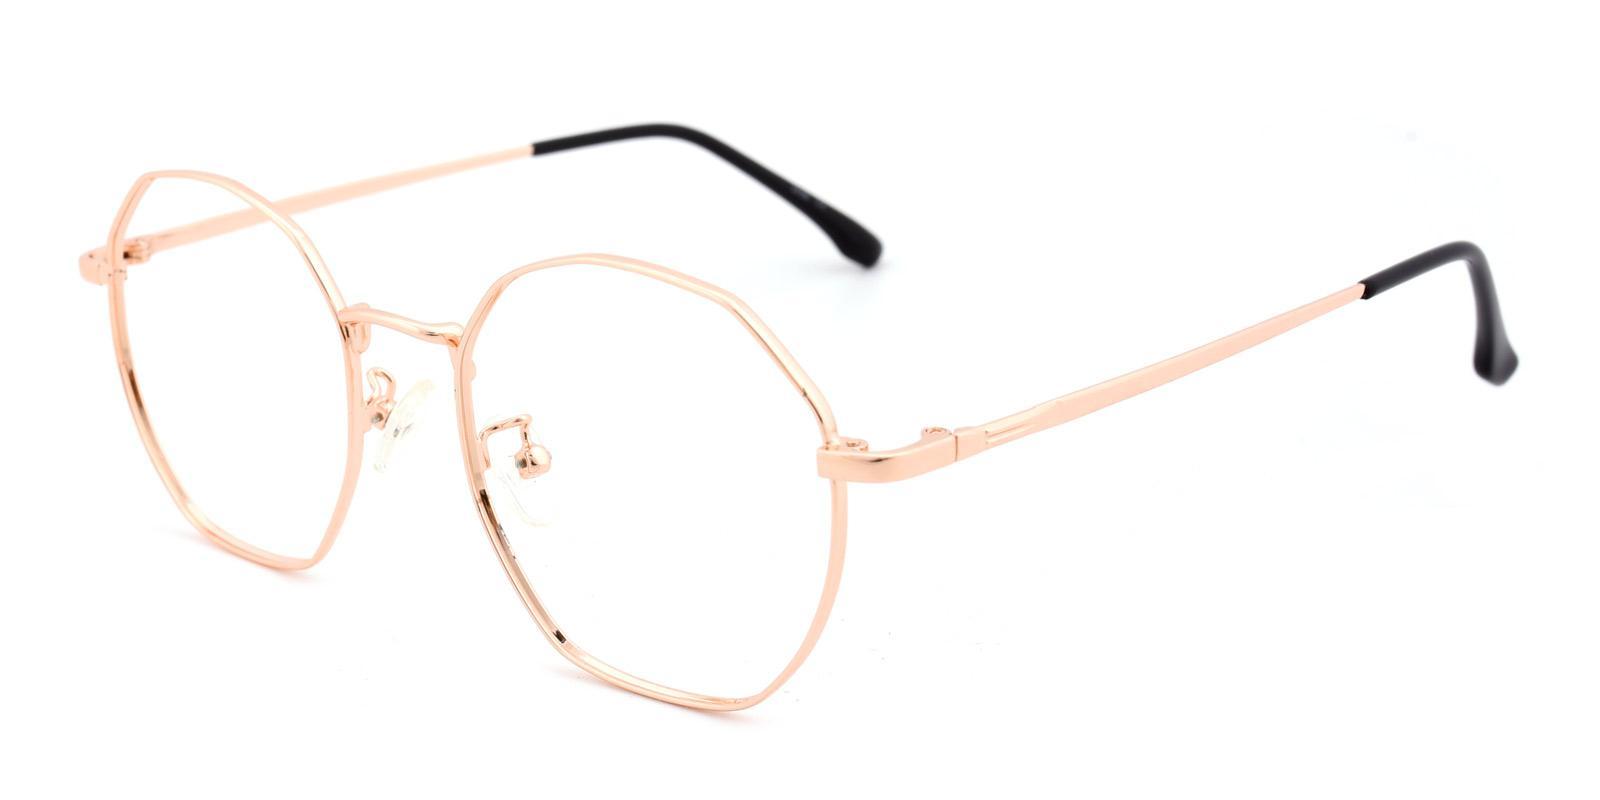 Loren-Gold-Geometric-Metal-Eyeglasses-additional1